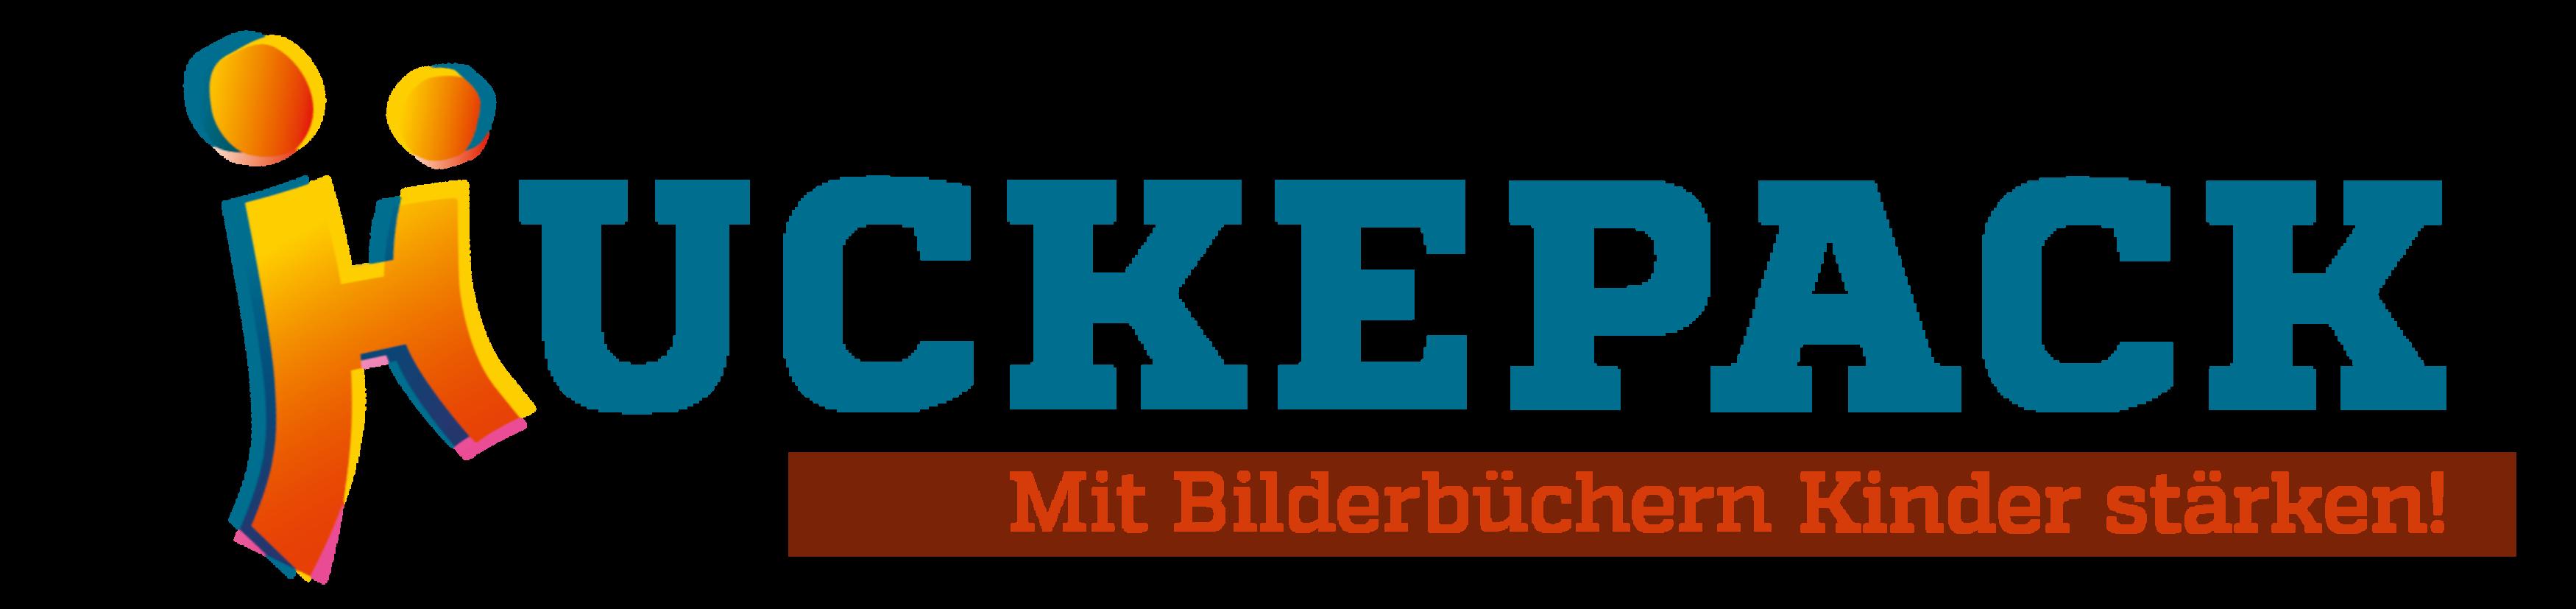 Huckepack-Bilderbuchpreis